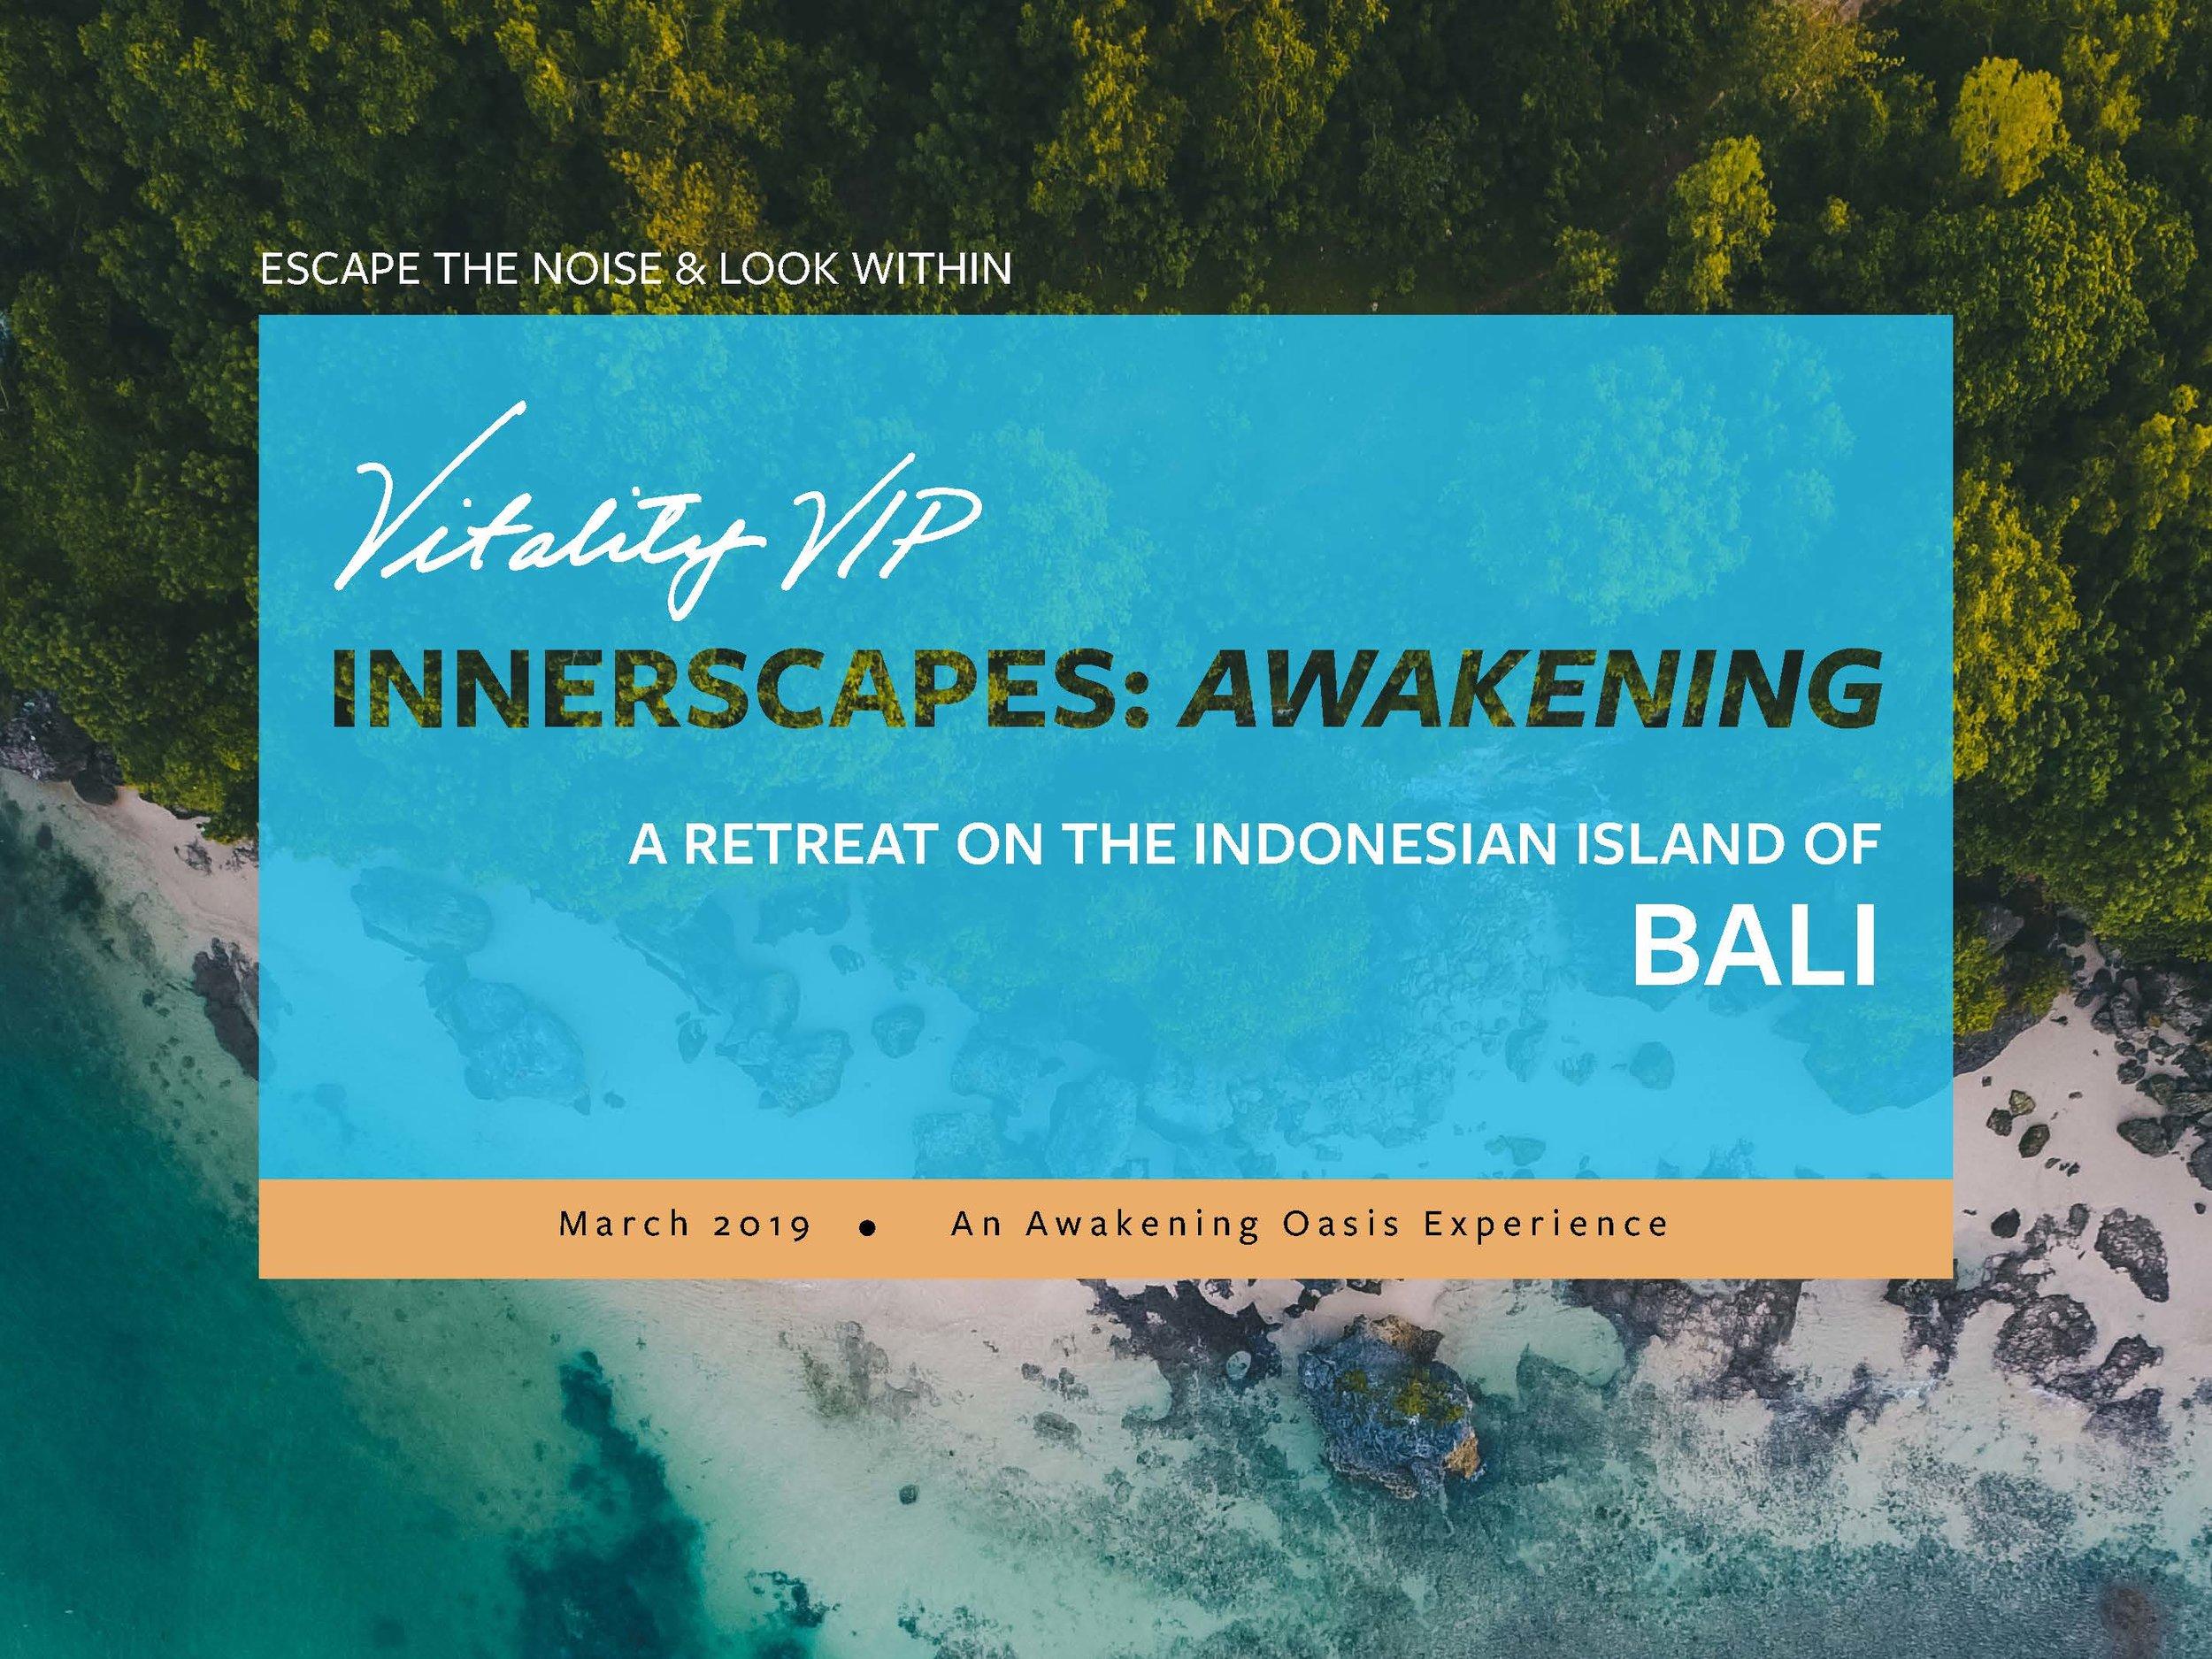 Innerscapes: Awakening Retreat in Bali